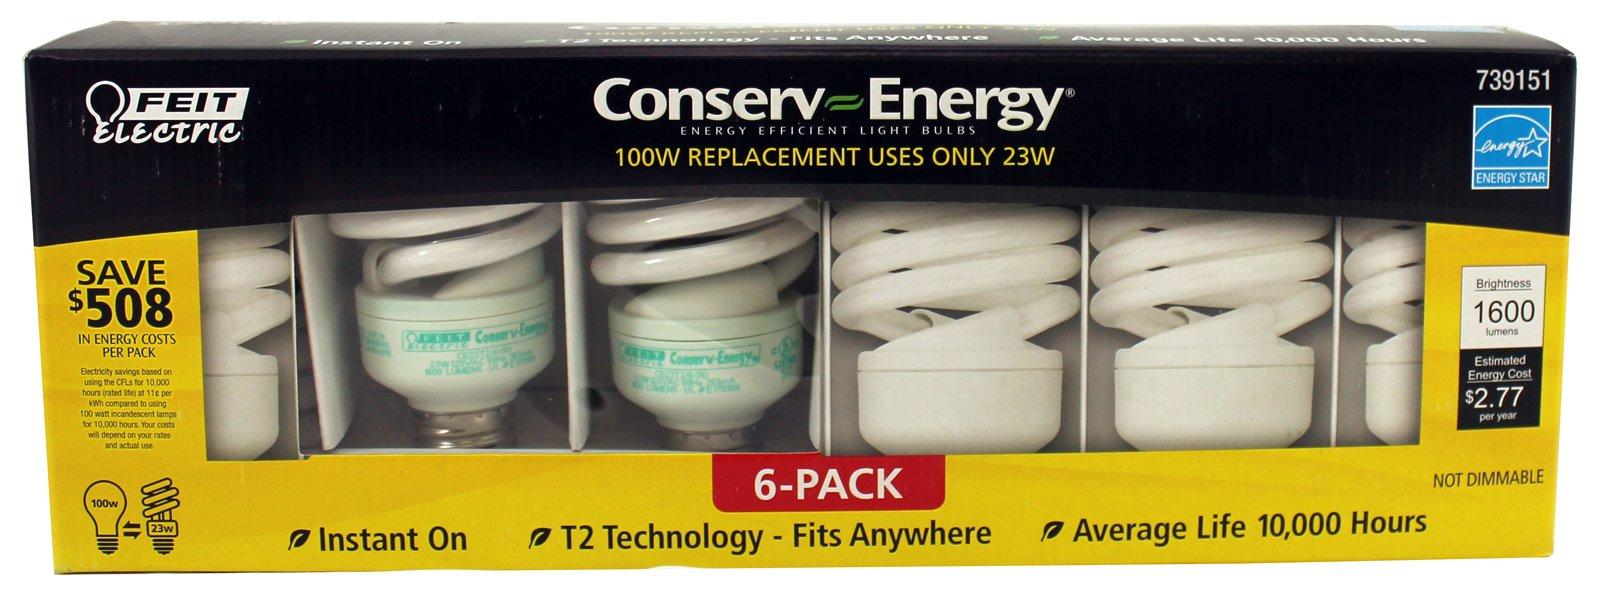 Feit Electric Conserv-energy 100w Equivalent CFL 23-watt Light Bulbs, 6-pack